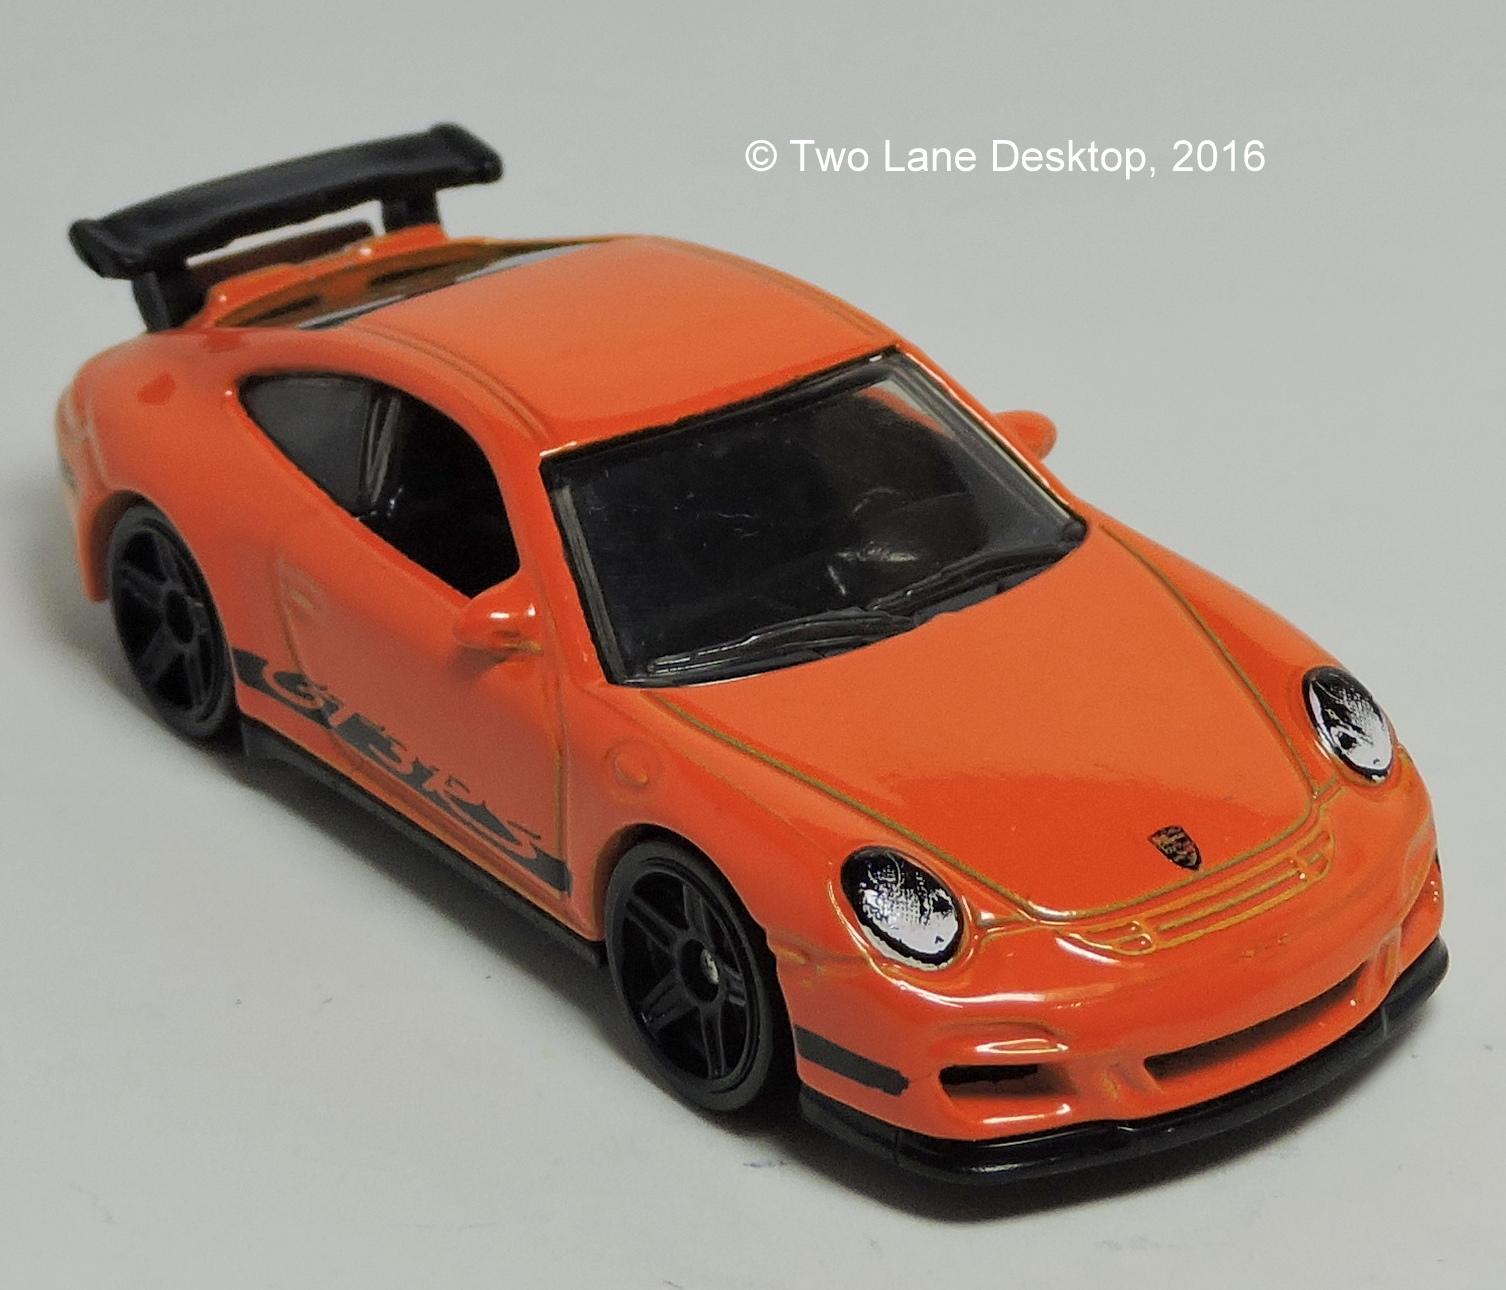 316 Outstanding Porsche 911 Gt2 Hot Wheels Cars Trend